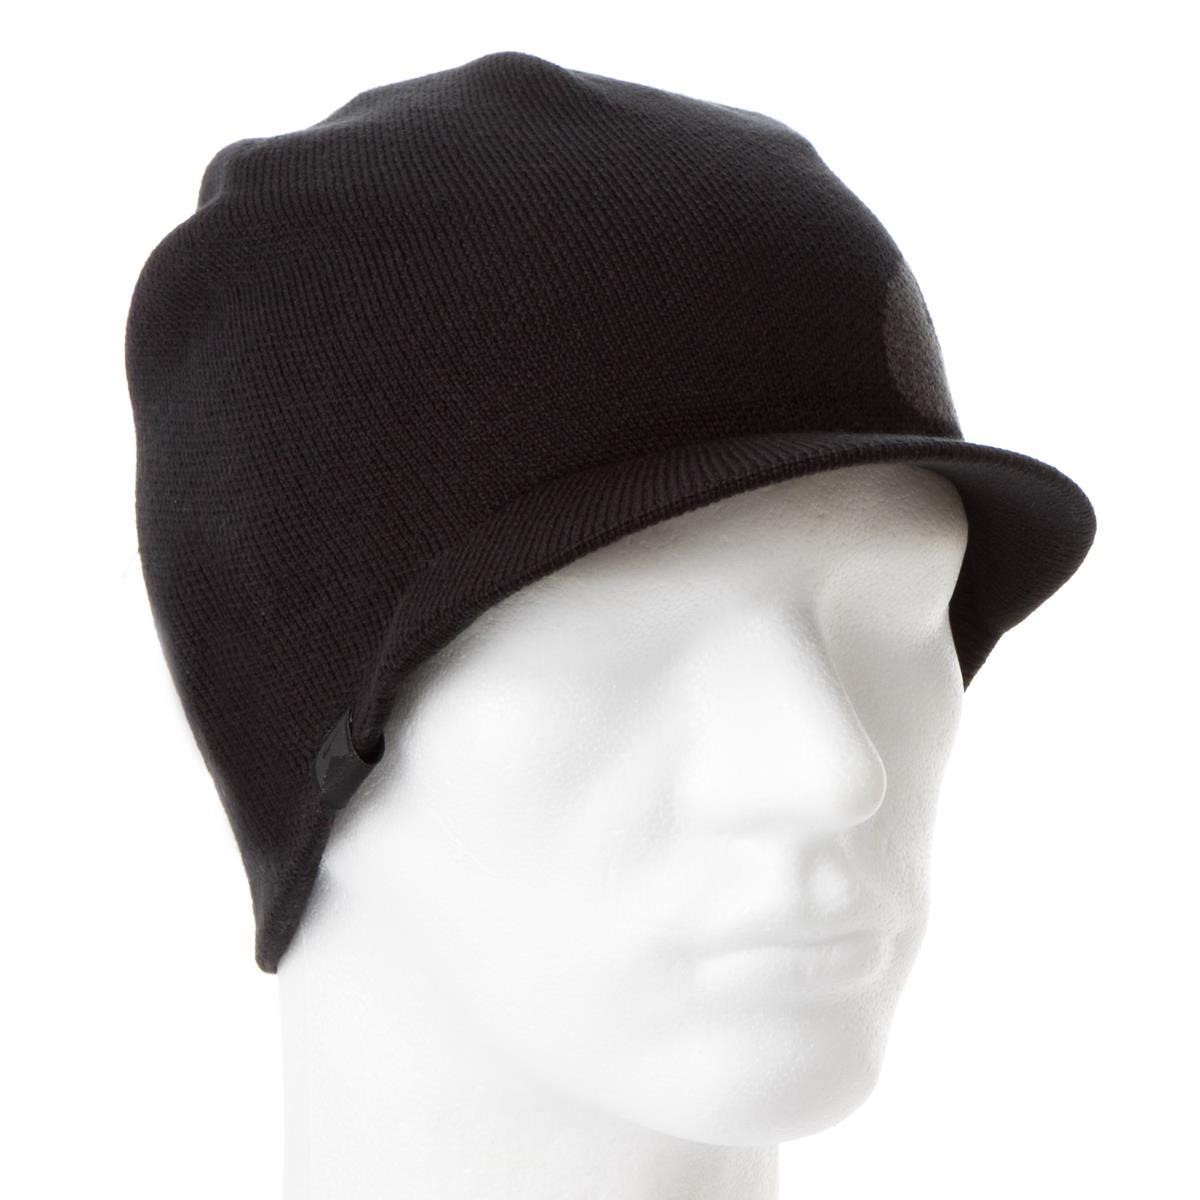 e3d248cd9203a ... new zealand cap get online 31b13 5c9dd nike visor beanie logo black  maciag offroad e65d3 160f5